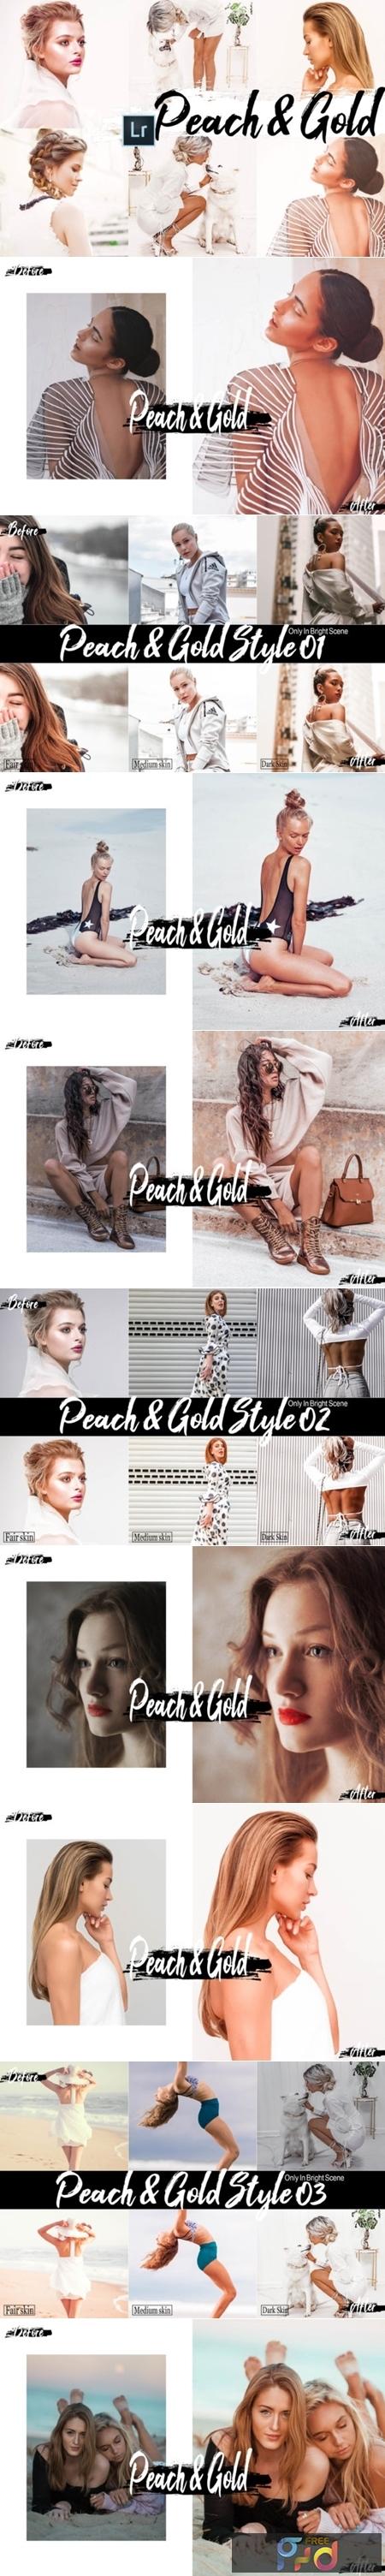 09 Peach & Gold Mobile Lightroom Presets 2536514 1